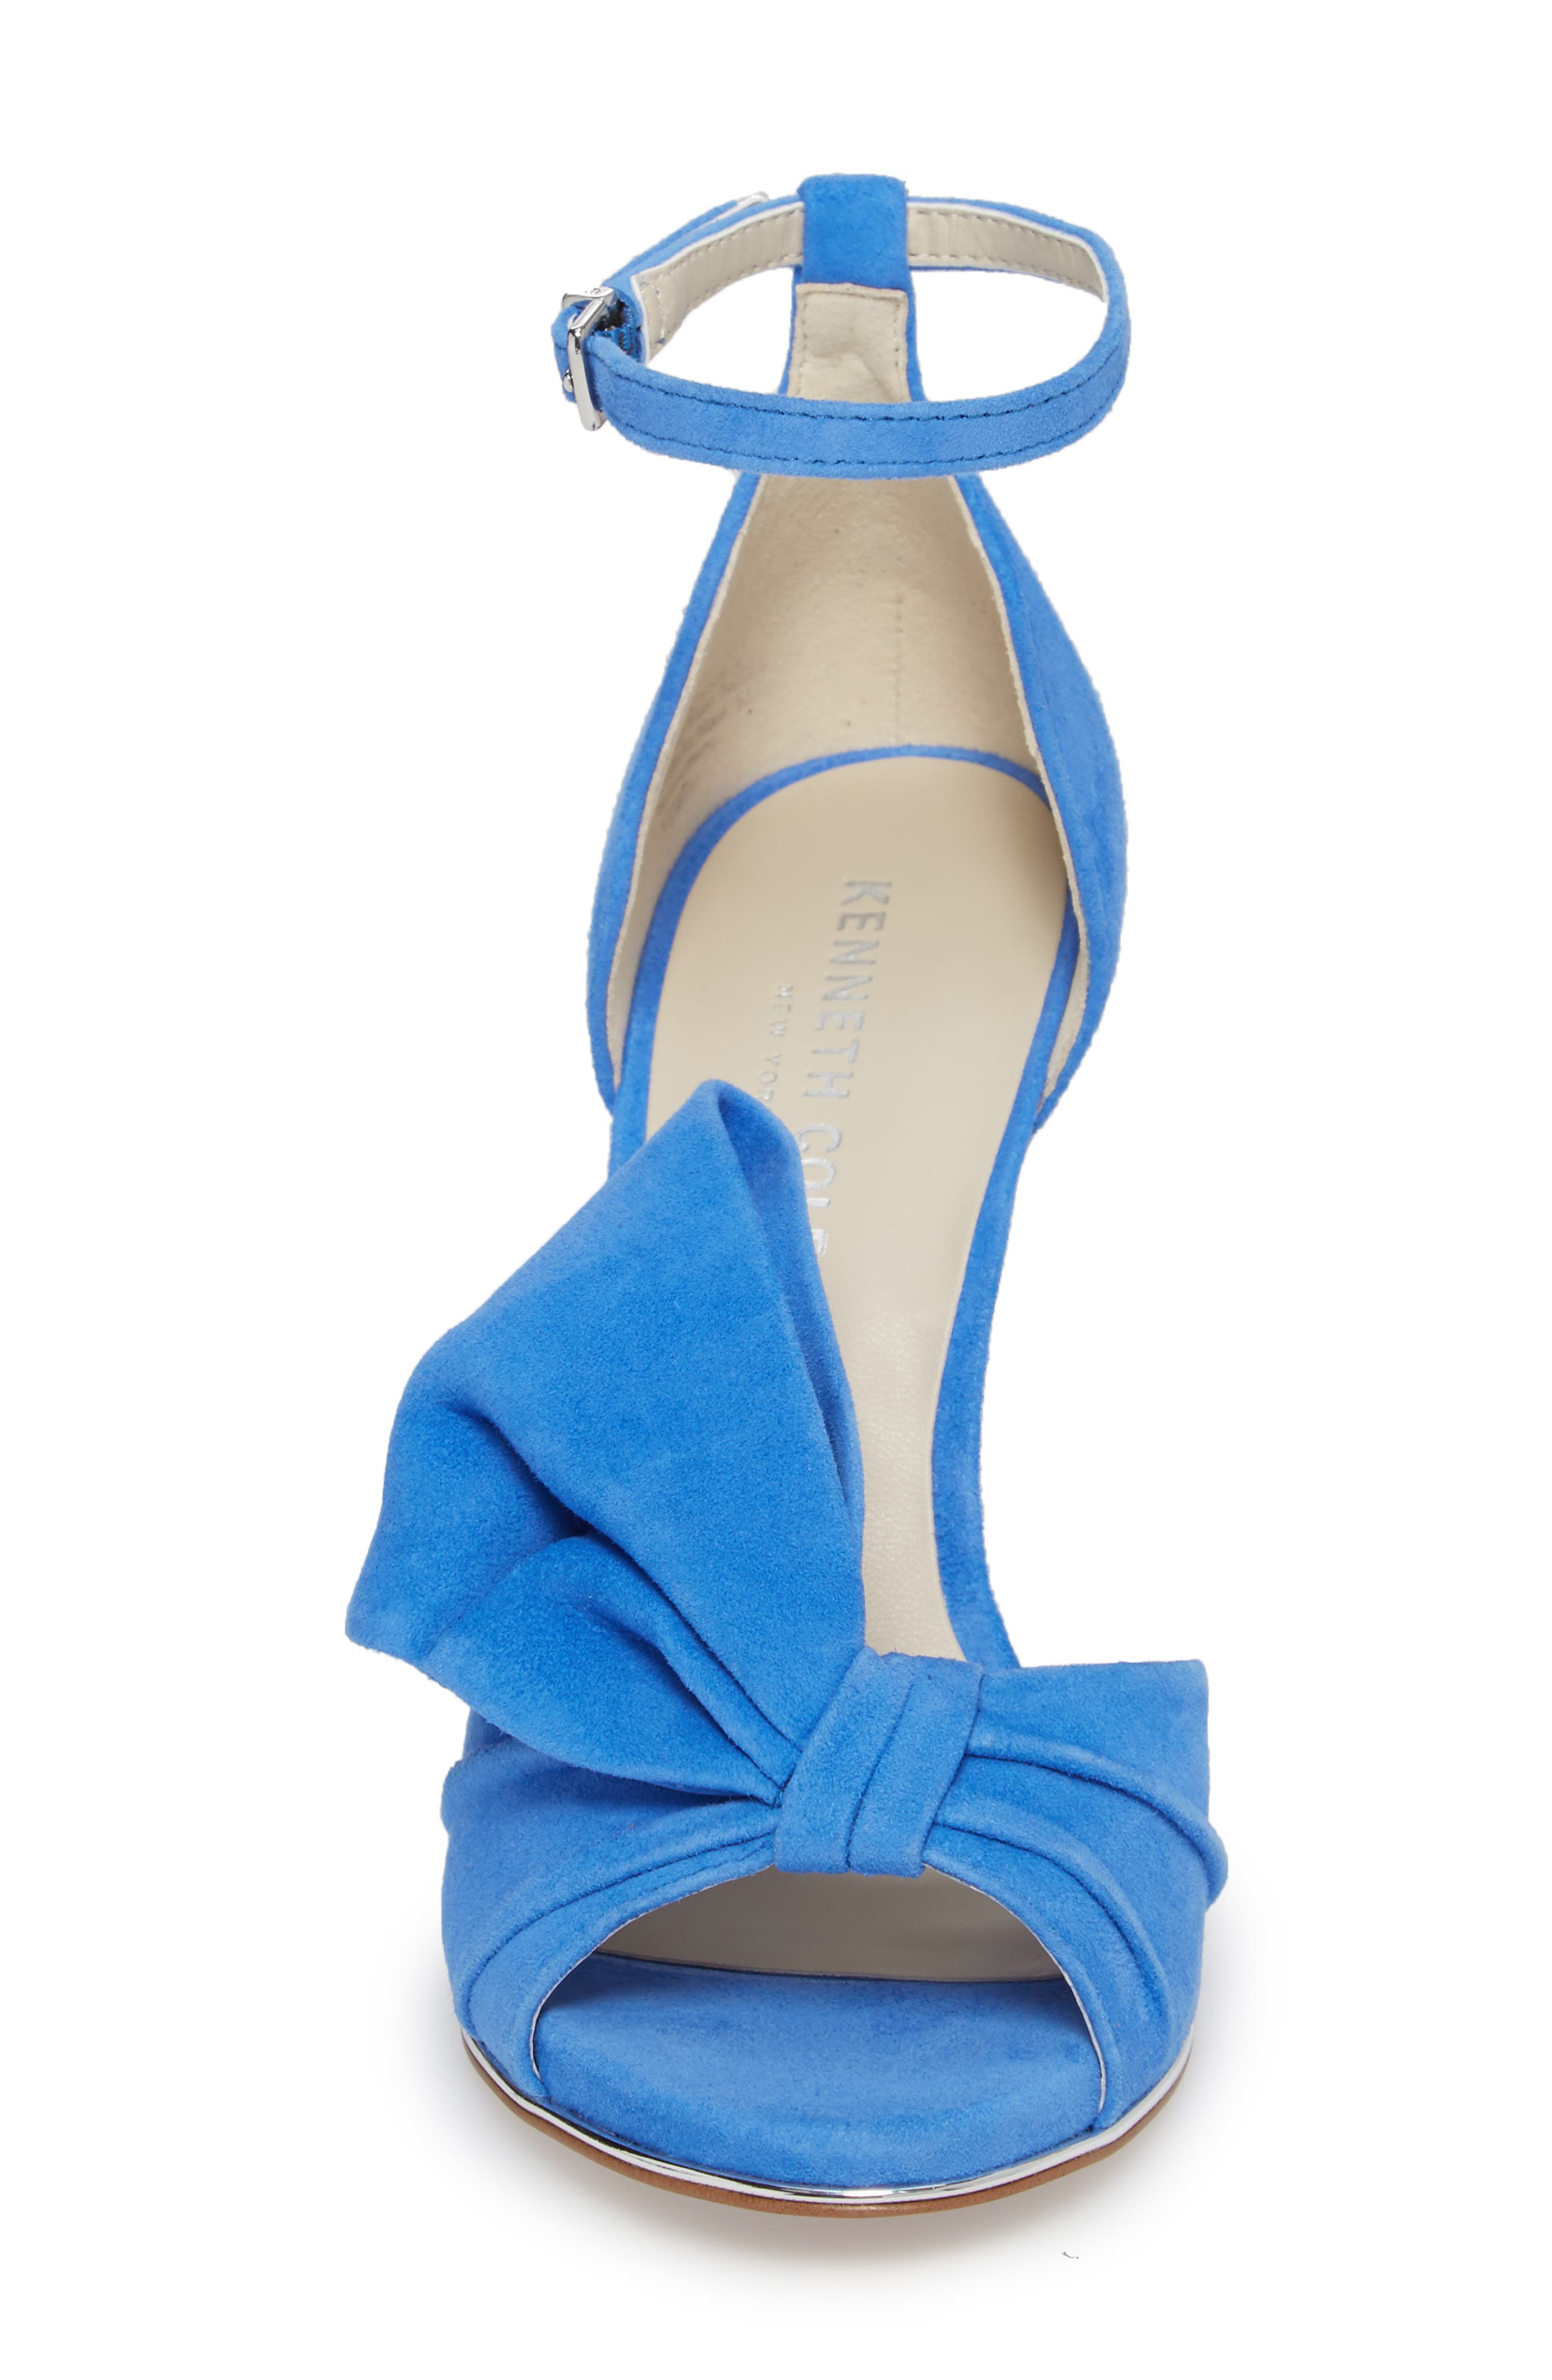 Blaine Ankle Strap Sandal,                             Alternate thumbnail 17, color,